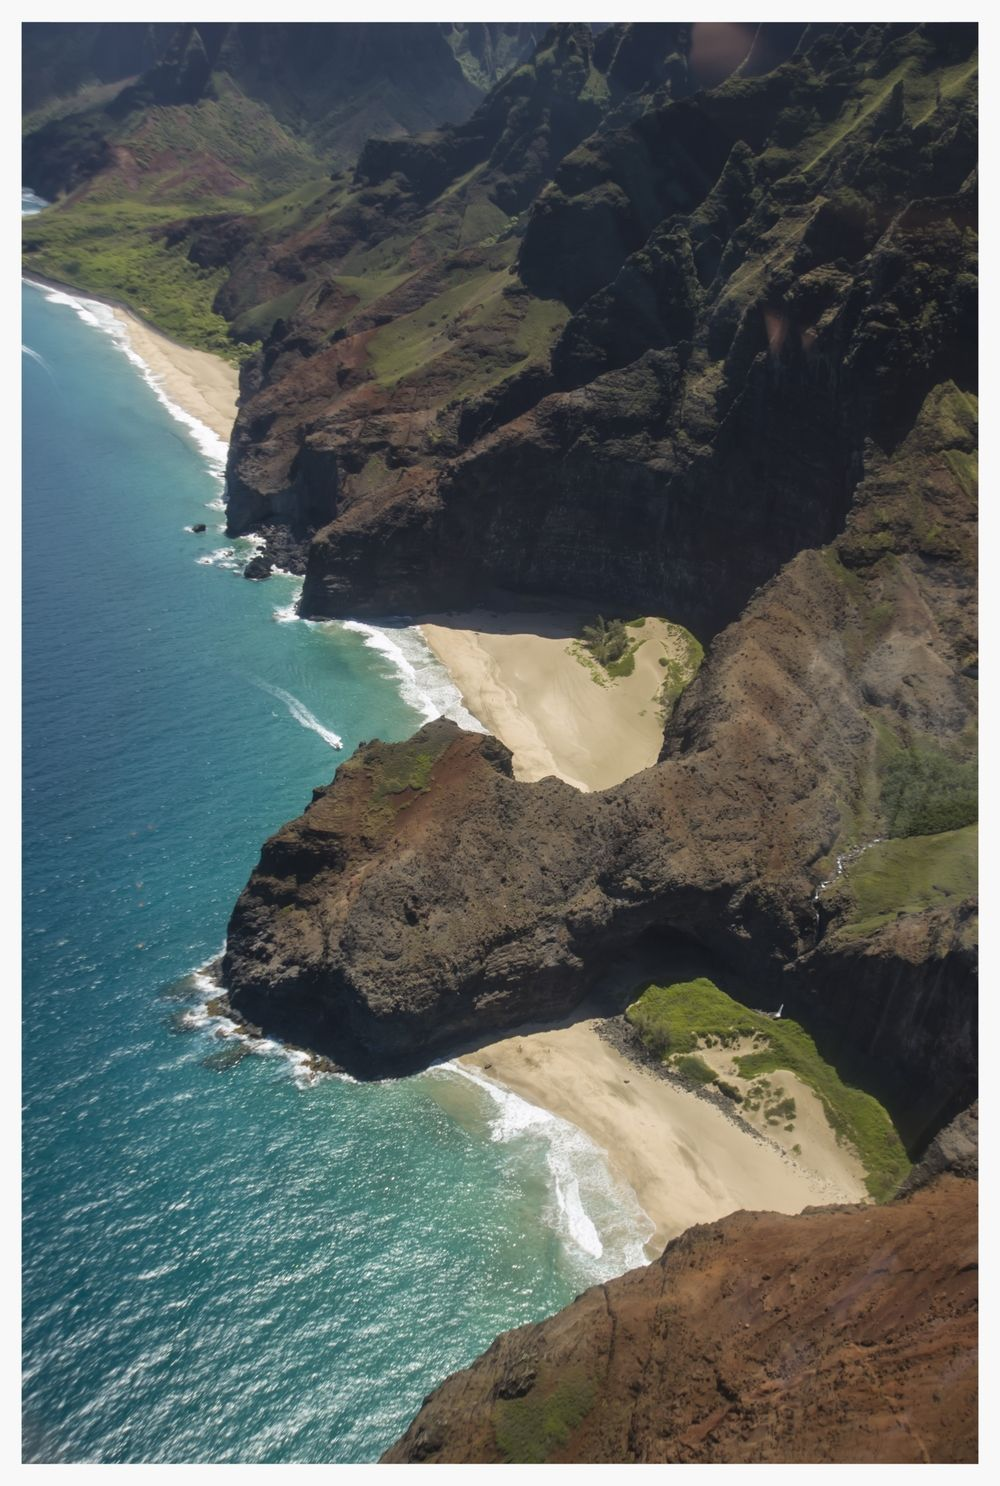 Napali Aerial 01.jpg | Travel noire, Go hawaii, Aerial ...